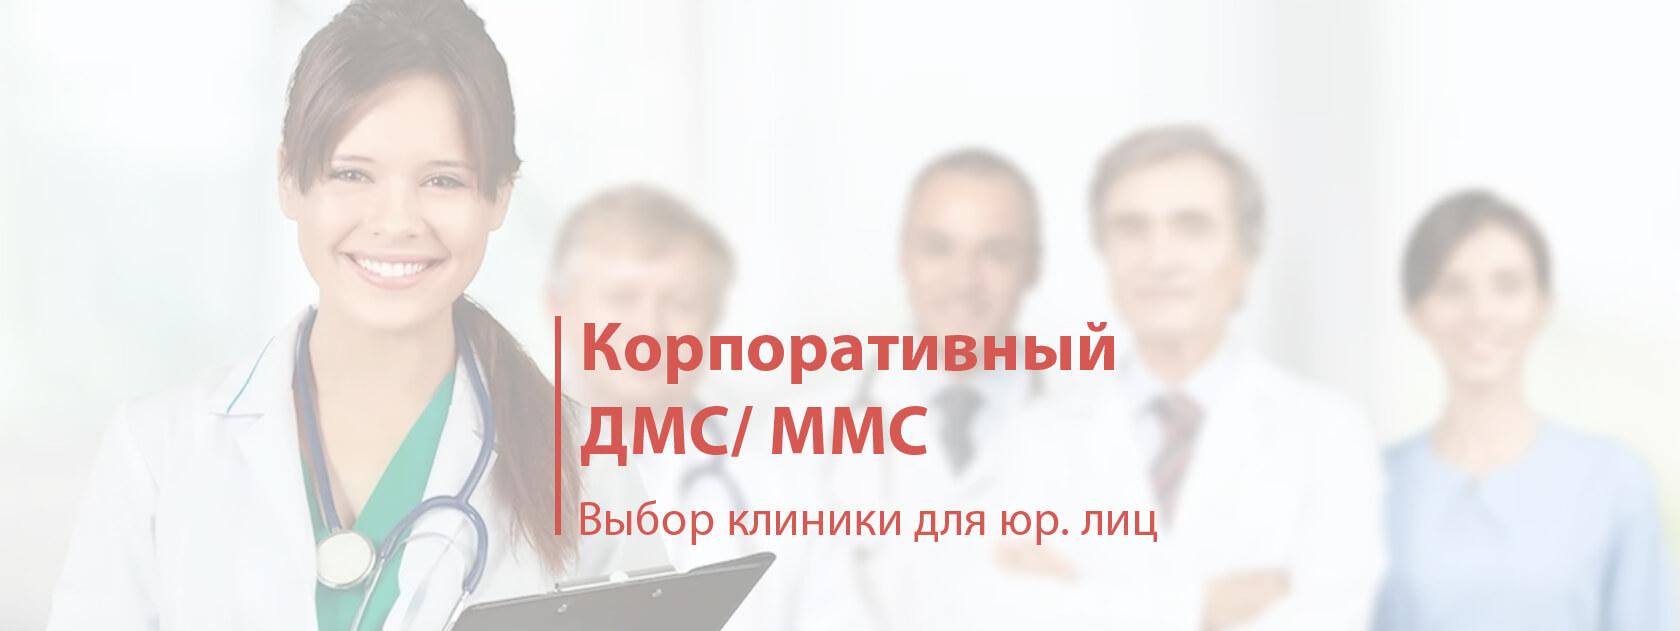 корпоративный дмс ммс выбор клиники